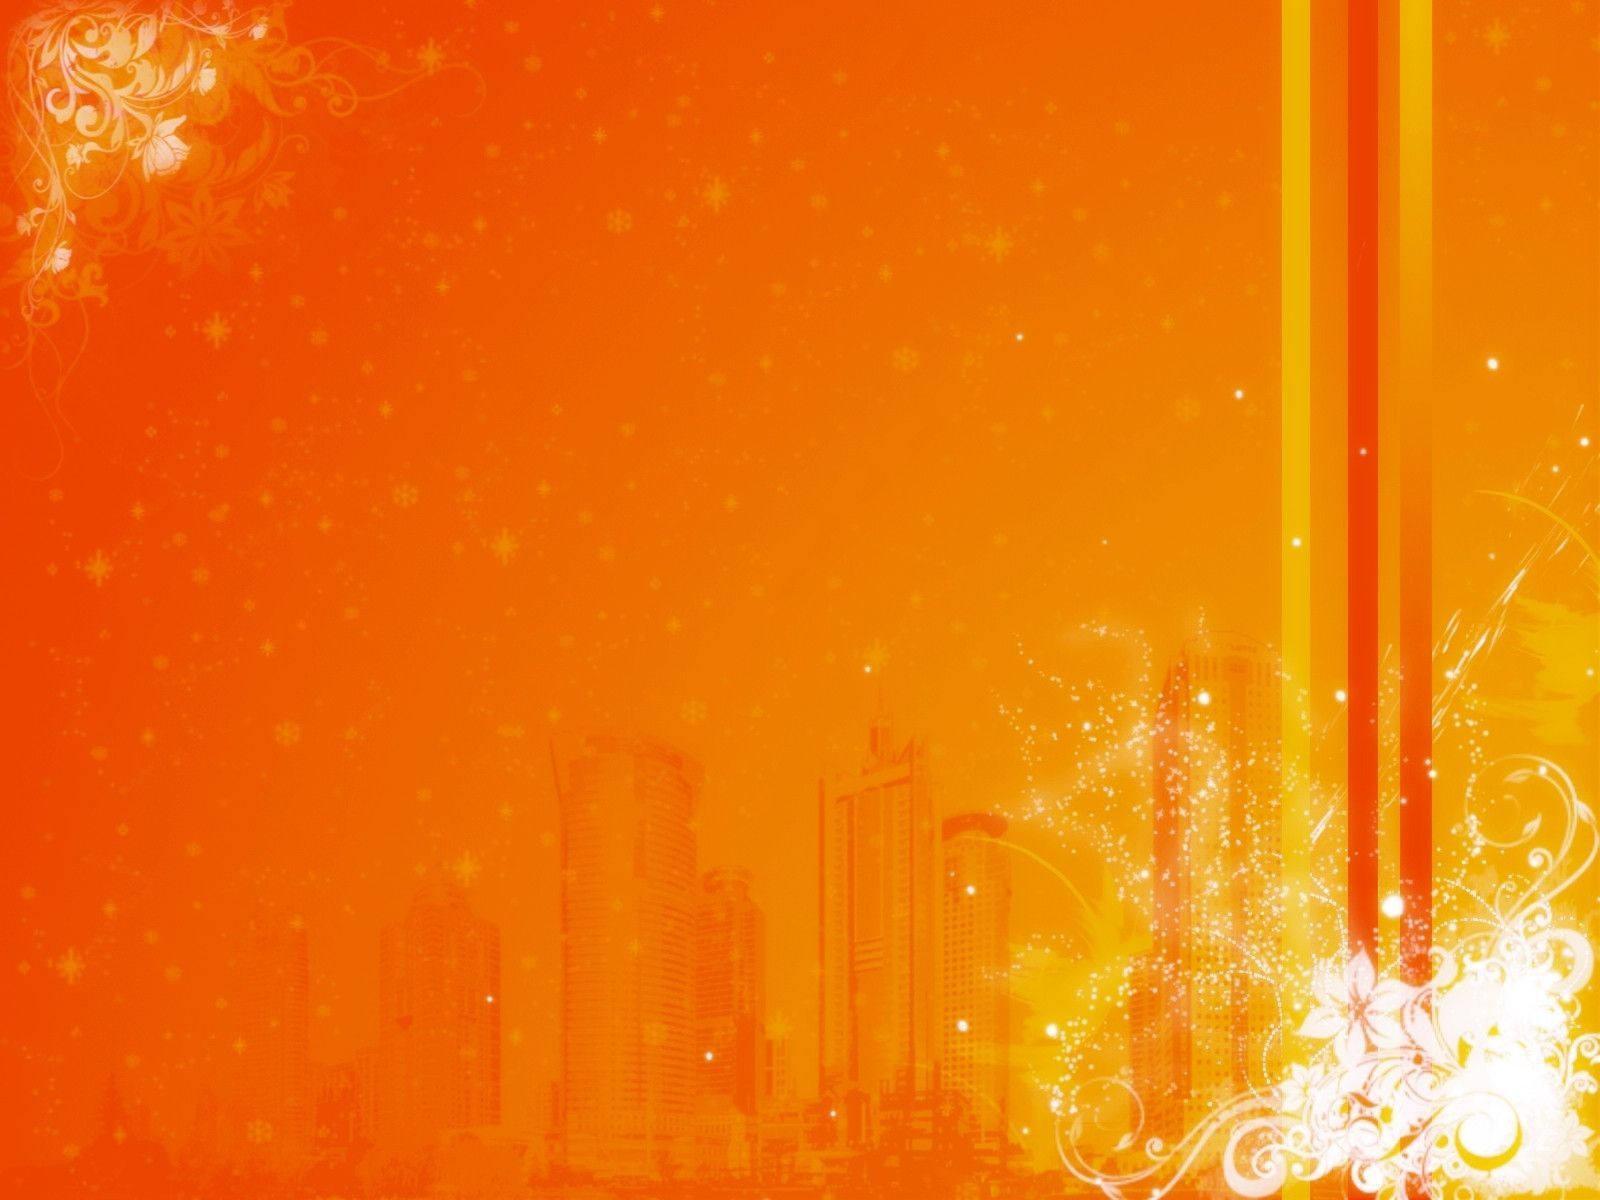 21 orange backgrounds wallpapers images pictures - Dark orange wallpaper ...